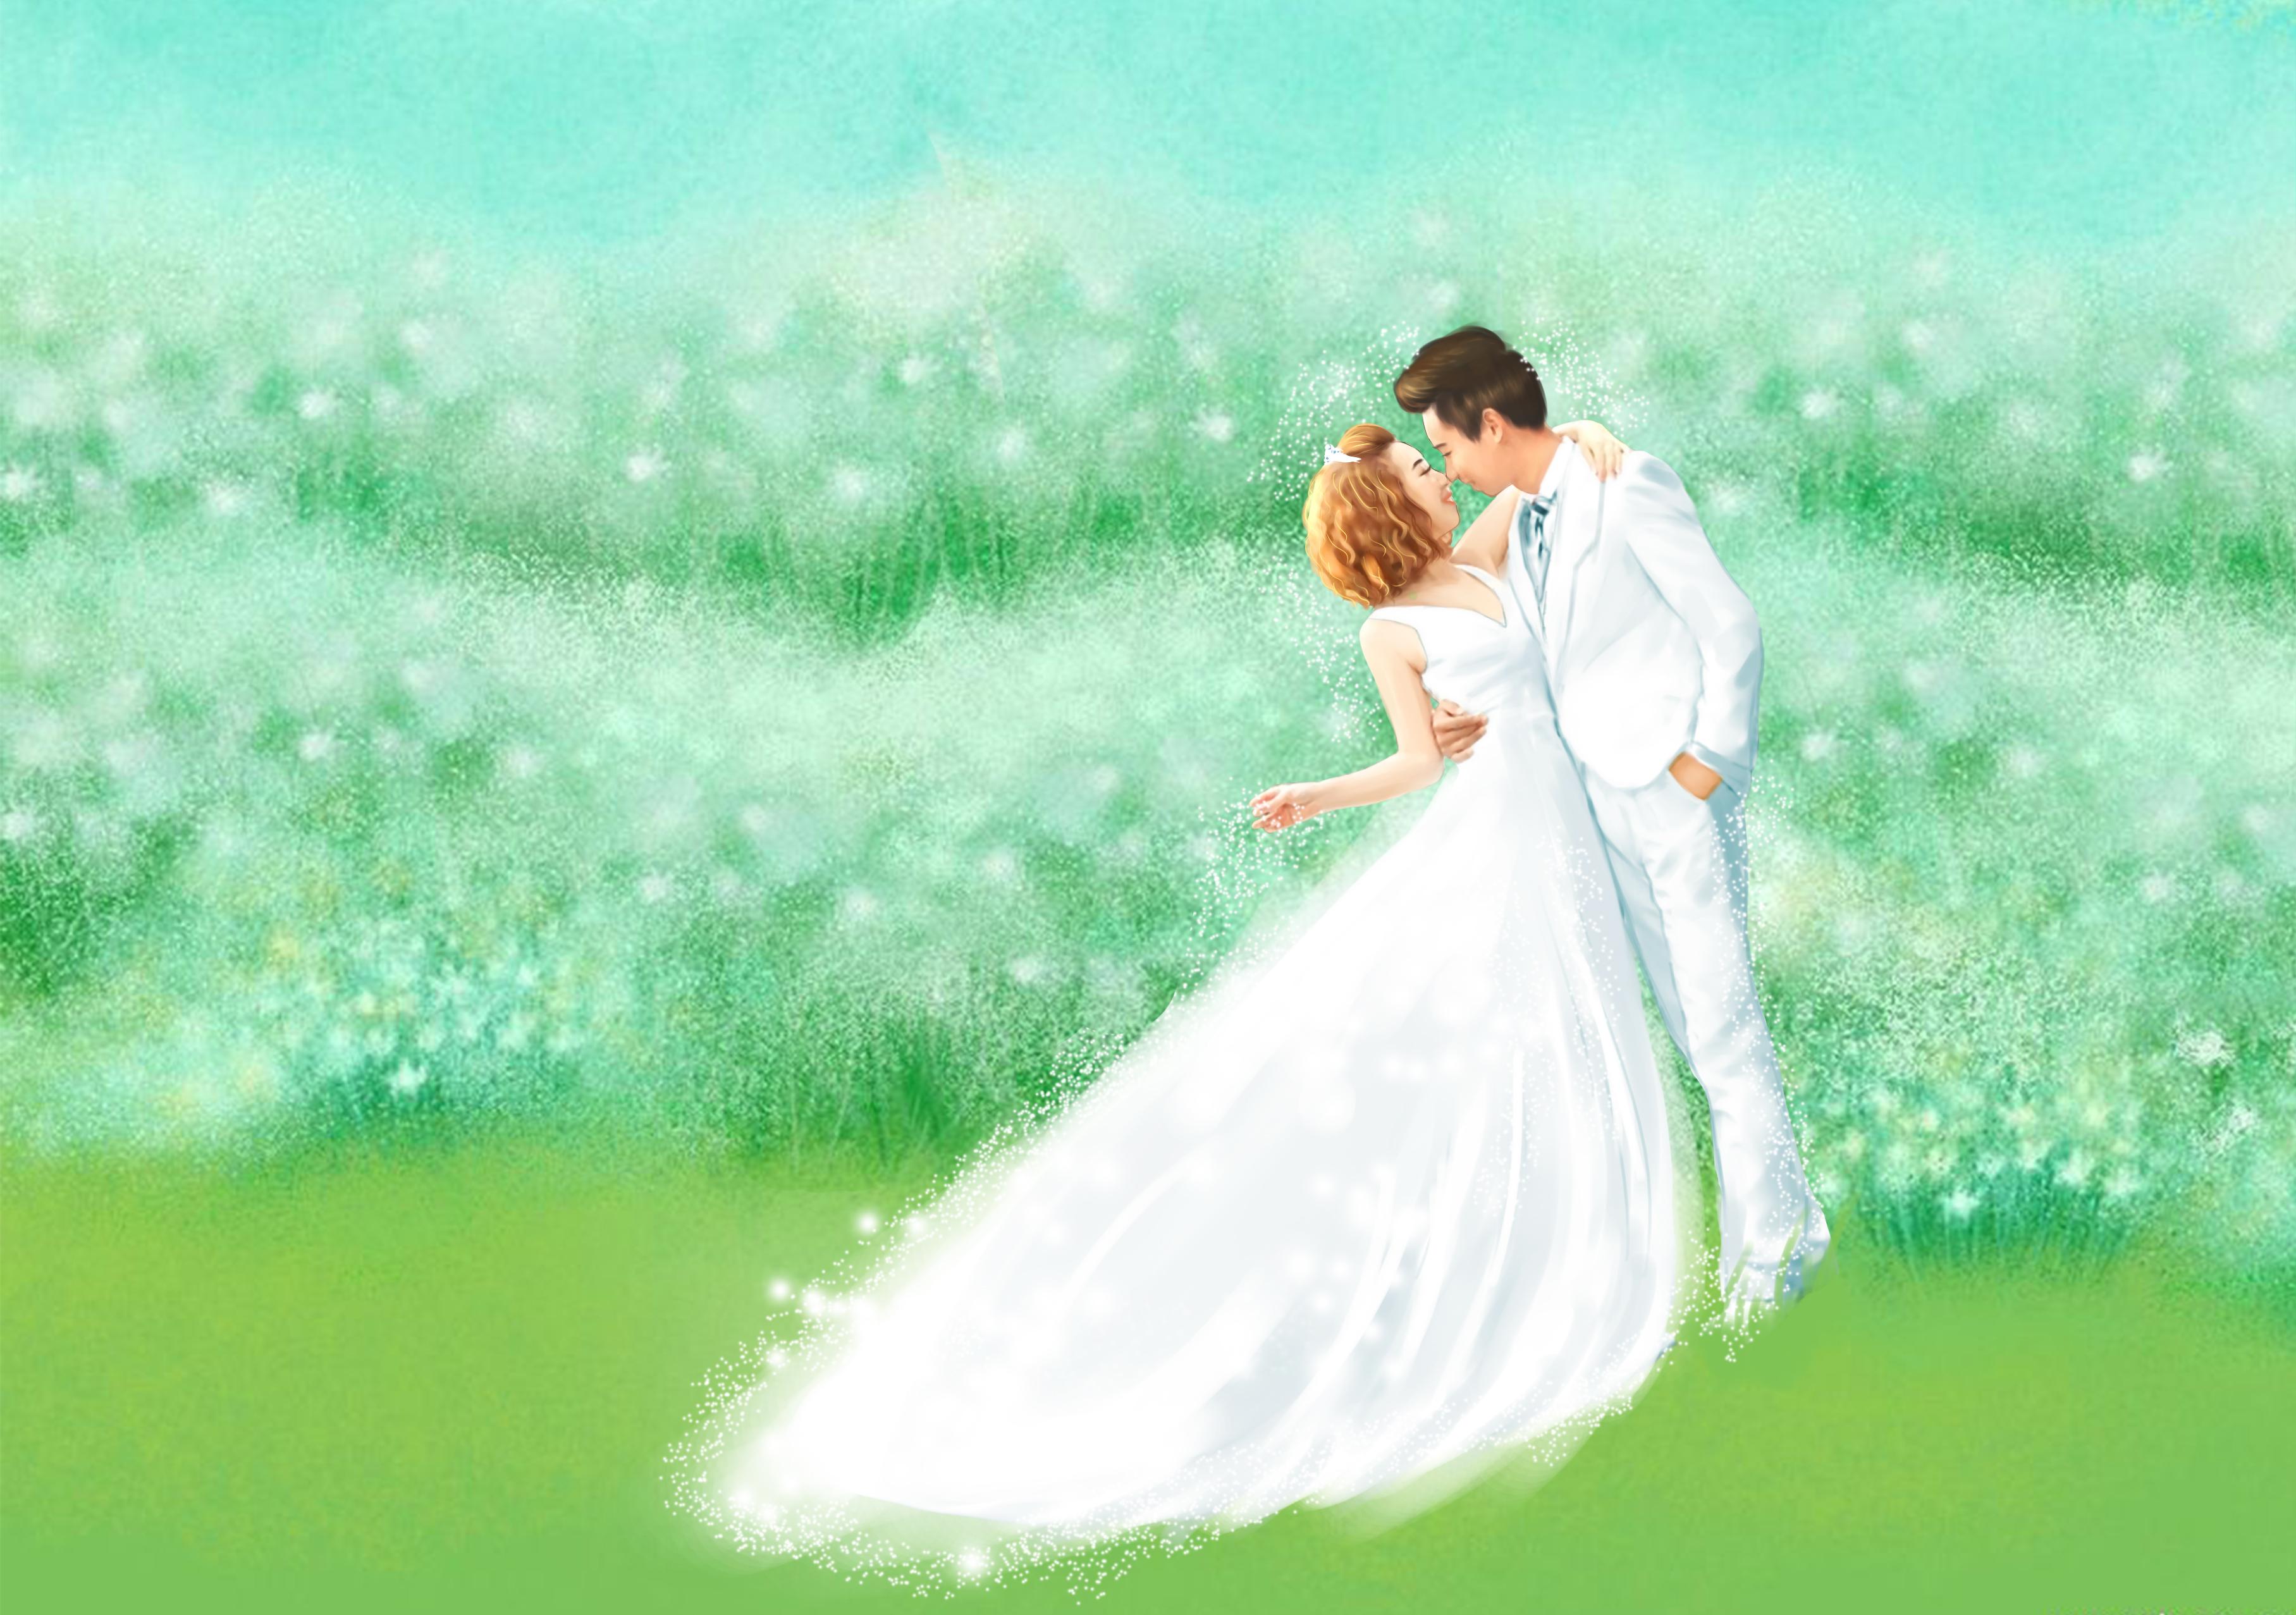 summer手绘————作品